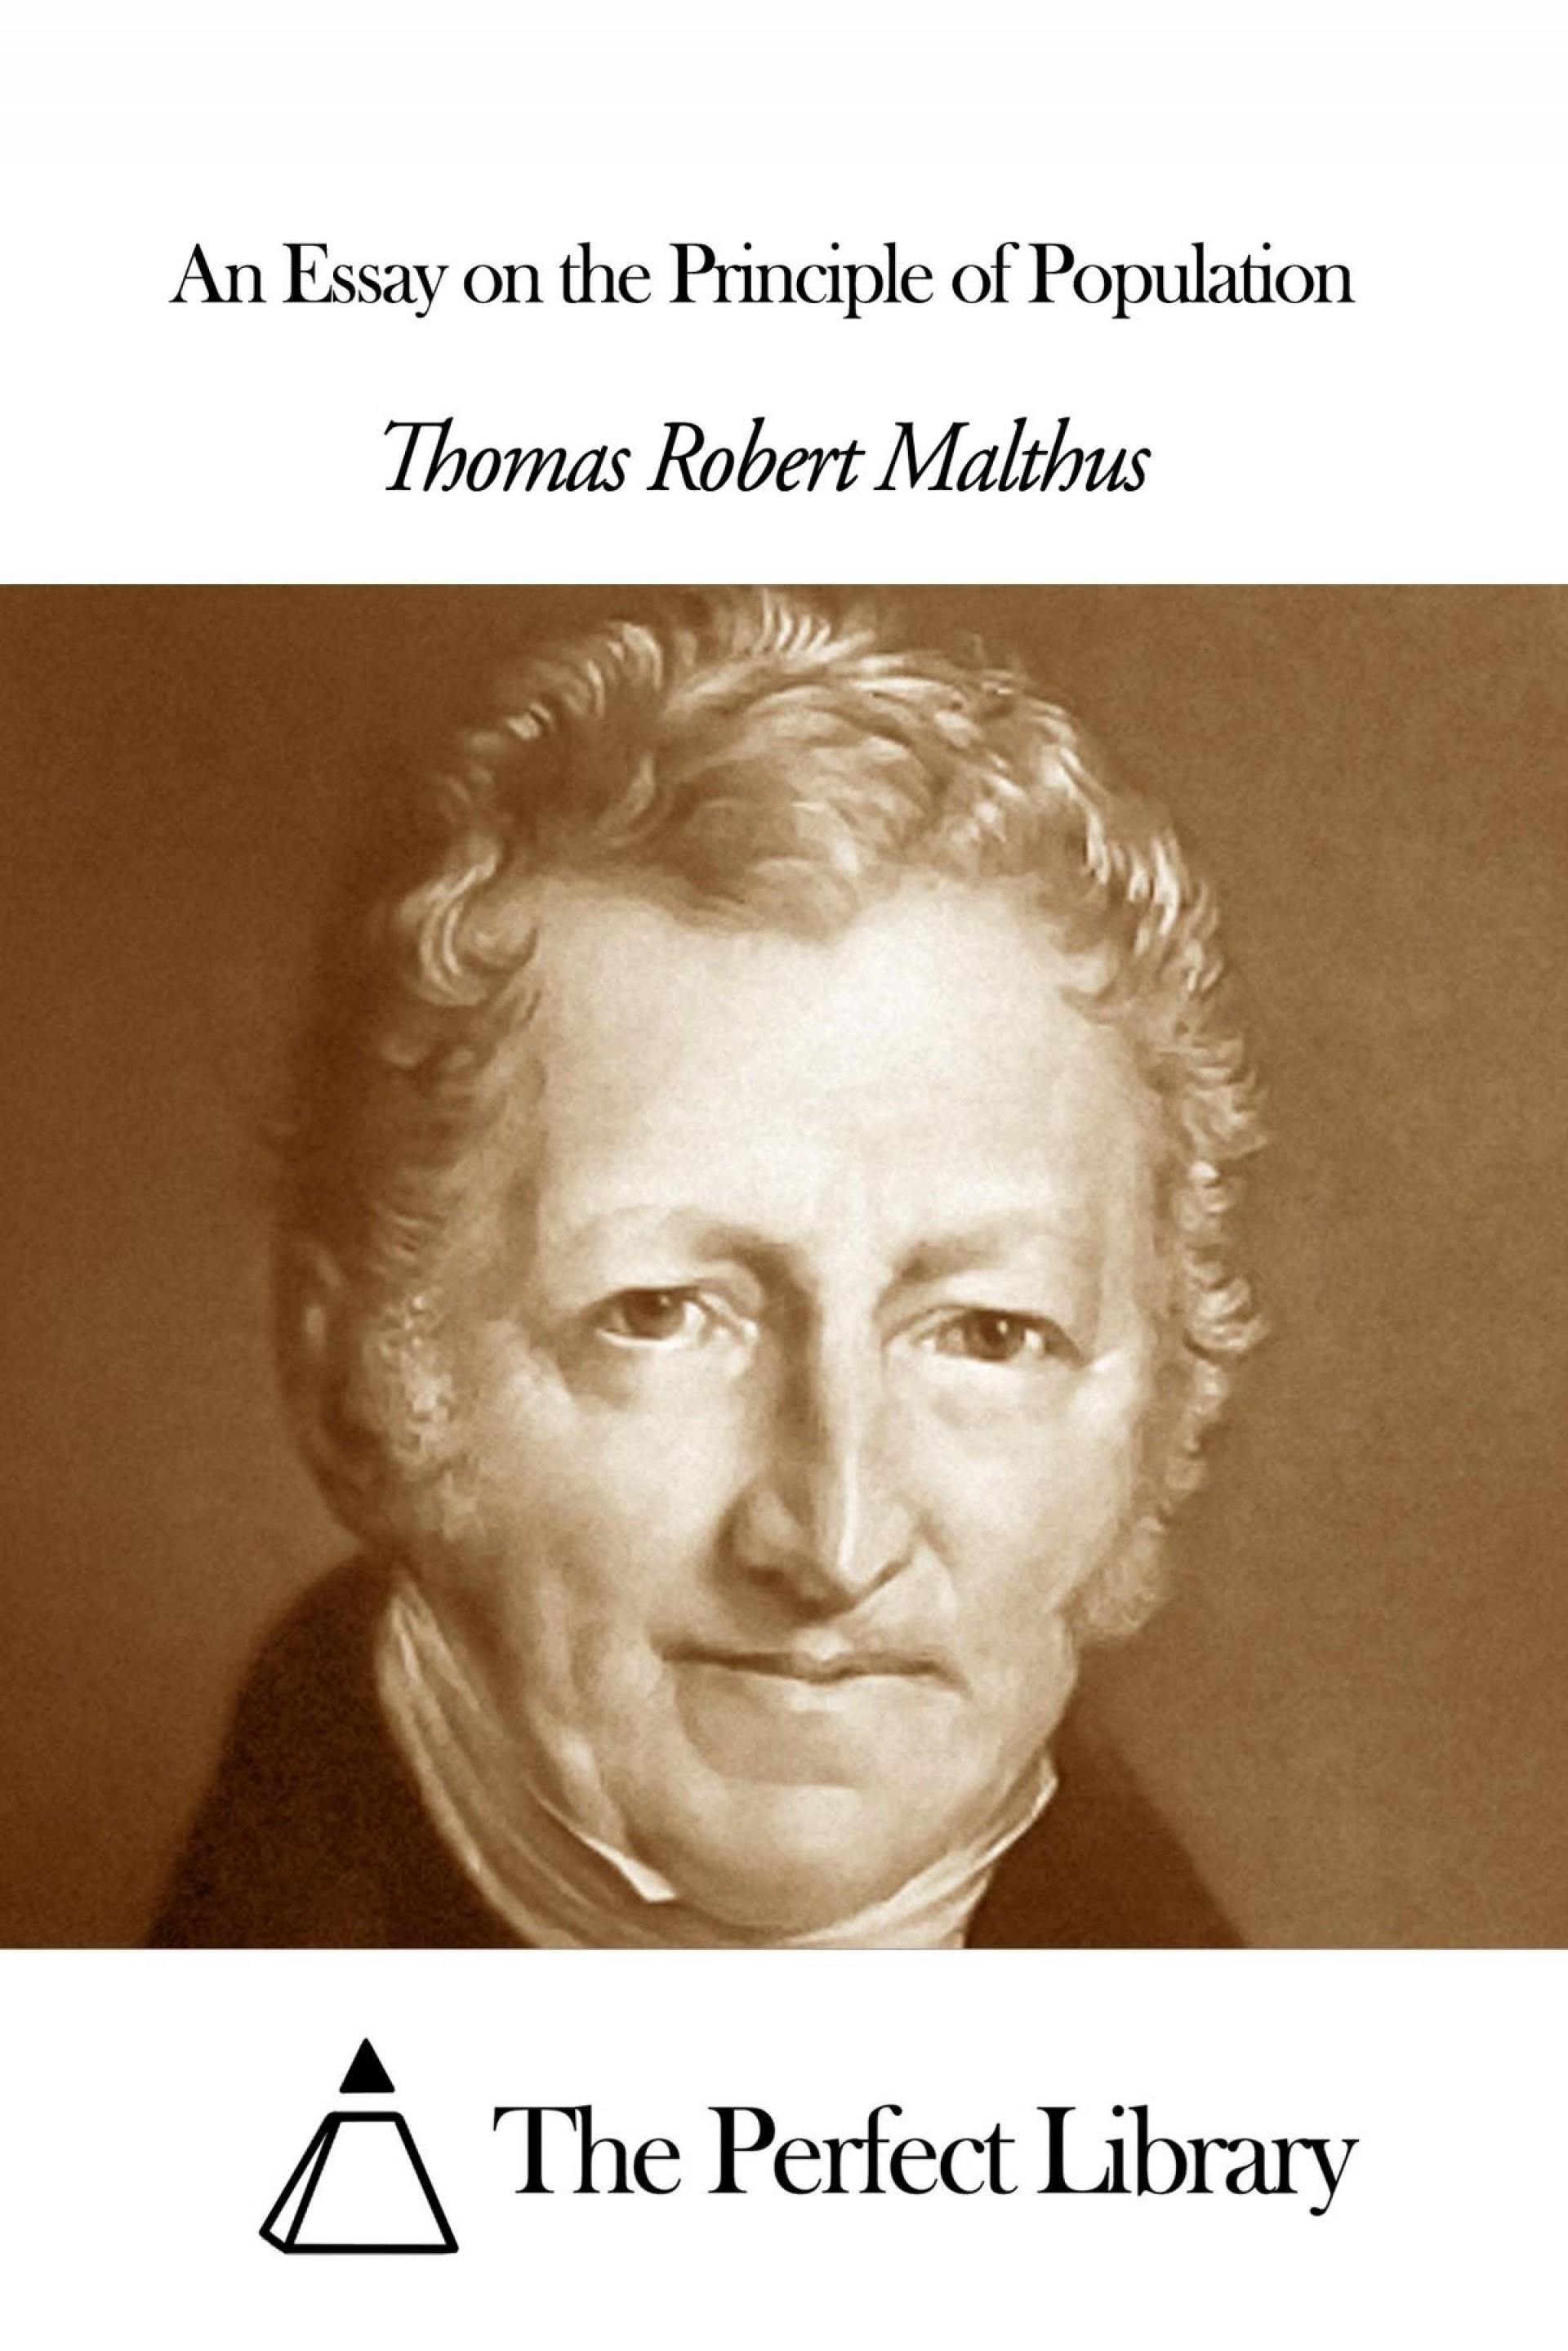 016 Essay Example On The Principle Of Population An Singular Pdf By Thomas Malthus Main Idea 1920